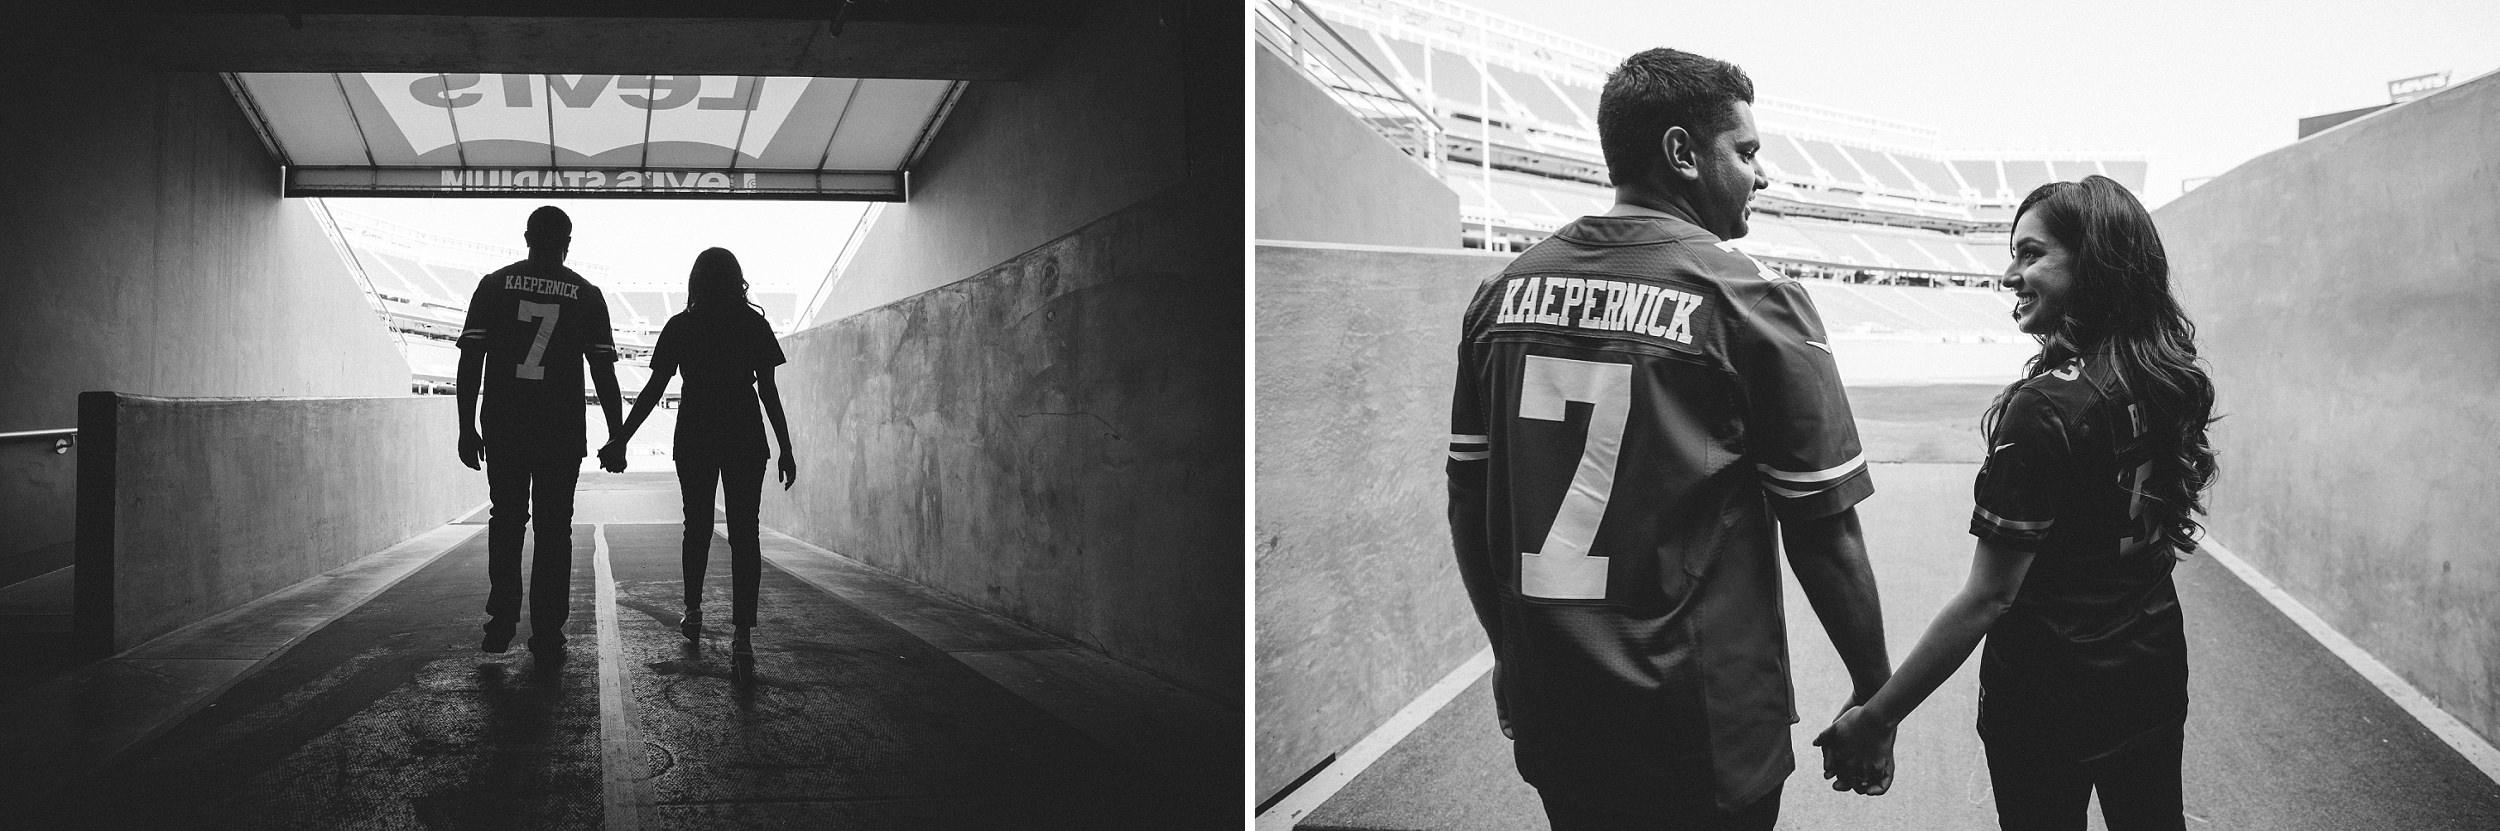 San-Francisco-49ers-Levis-Stadium-Engagement-Photography-016.jpg